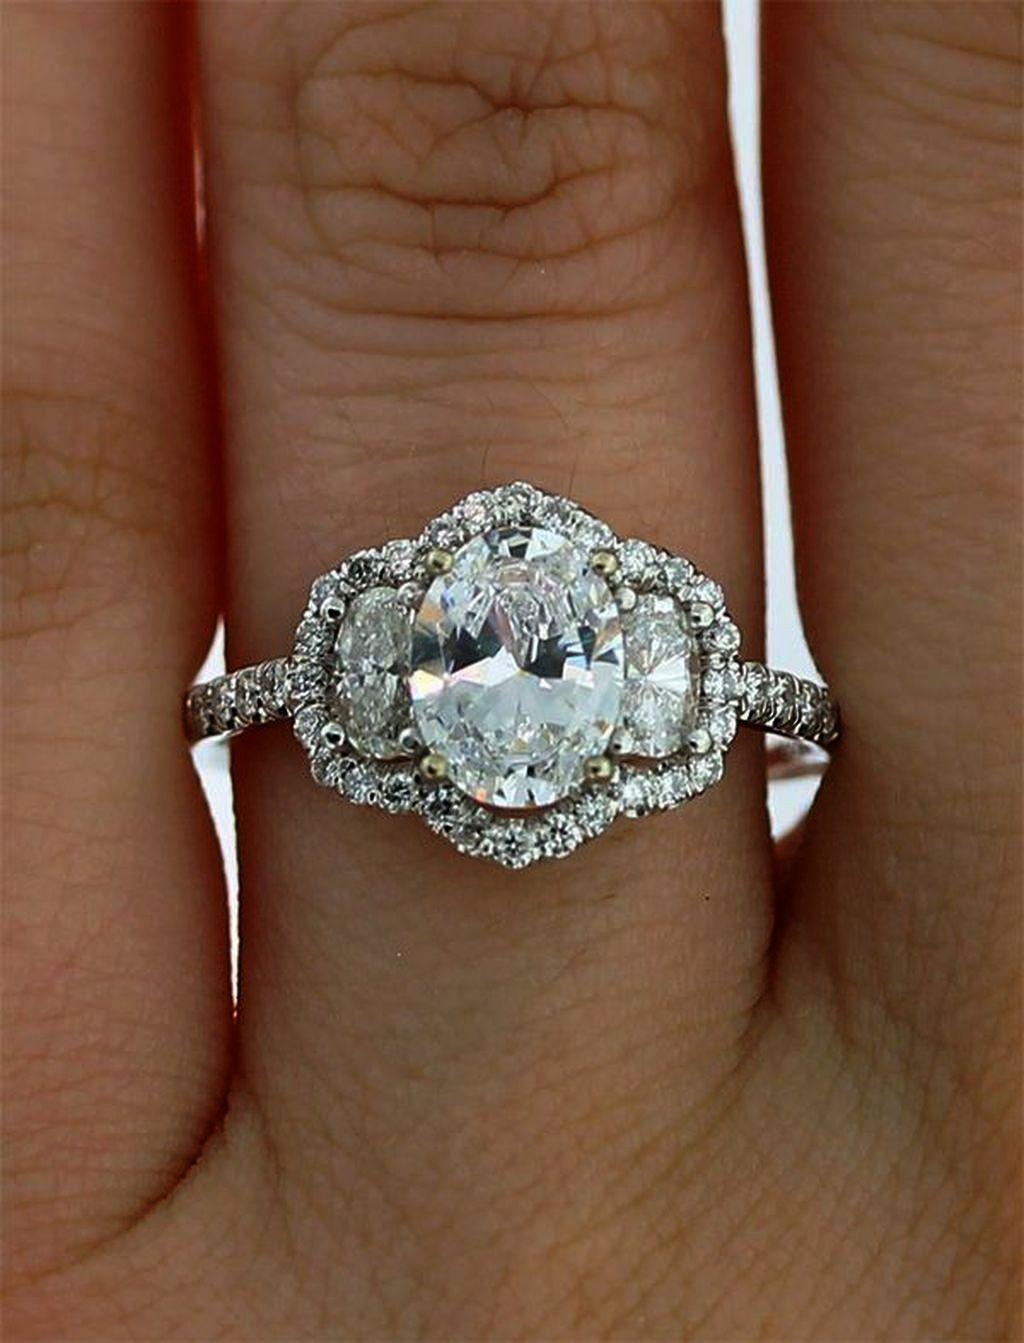 Used Wedding Rings.Value Of Used Engagement Ring Antique Engagement Ring Edwardian